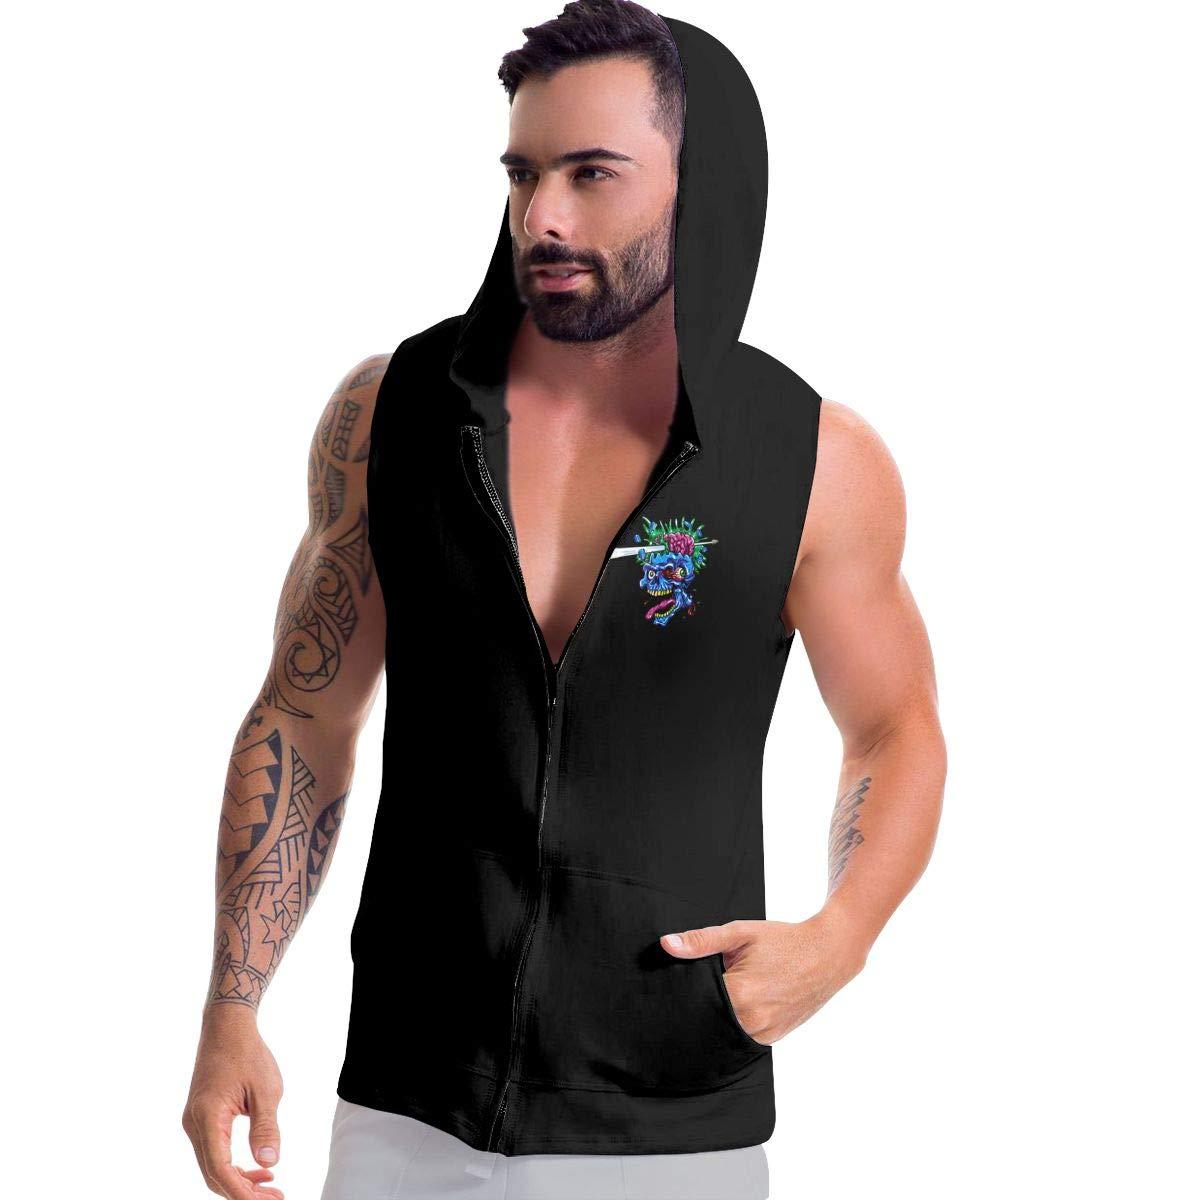 SHENGN Mens Custom Fashion with Hood Sack A Bullet Through A Zombie Skull Zipper Sweatshirt